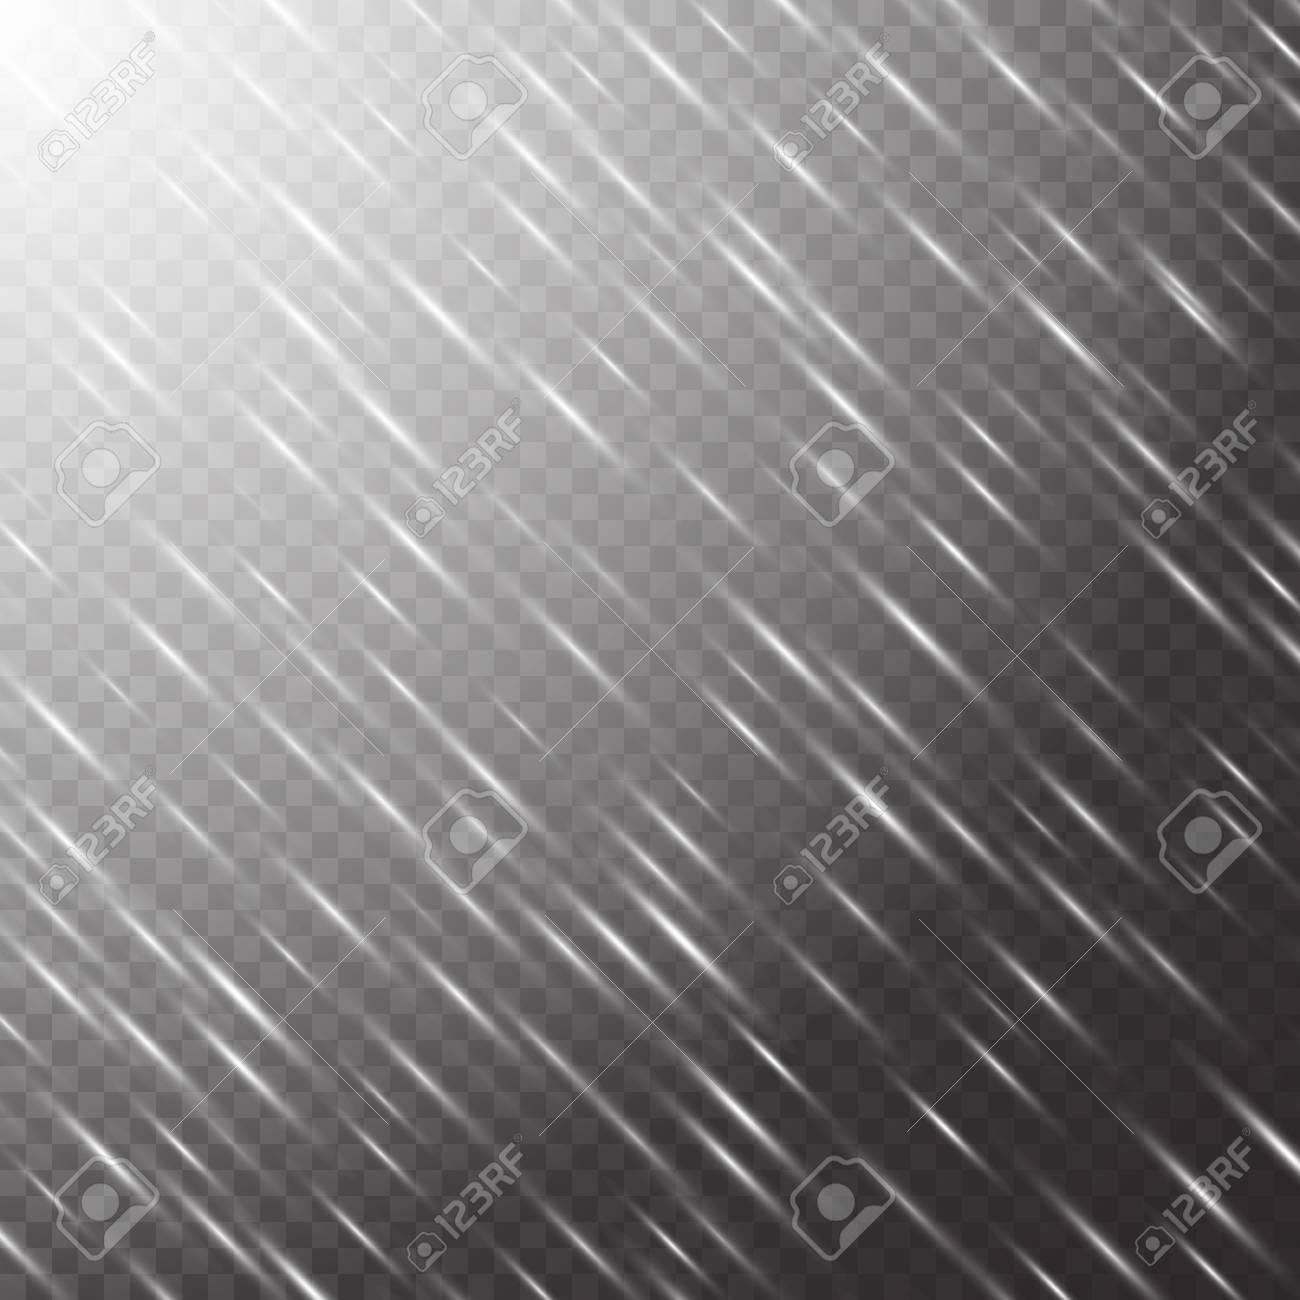 Electricity Background Winter Lights Sparkle Vector Sun Flare